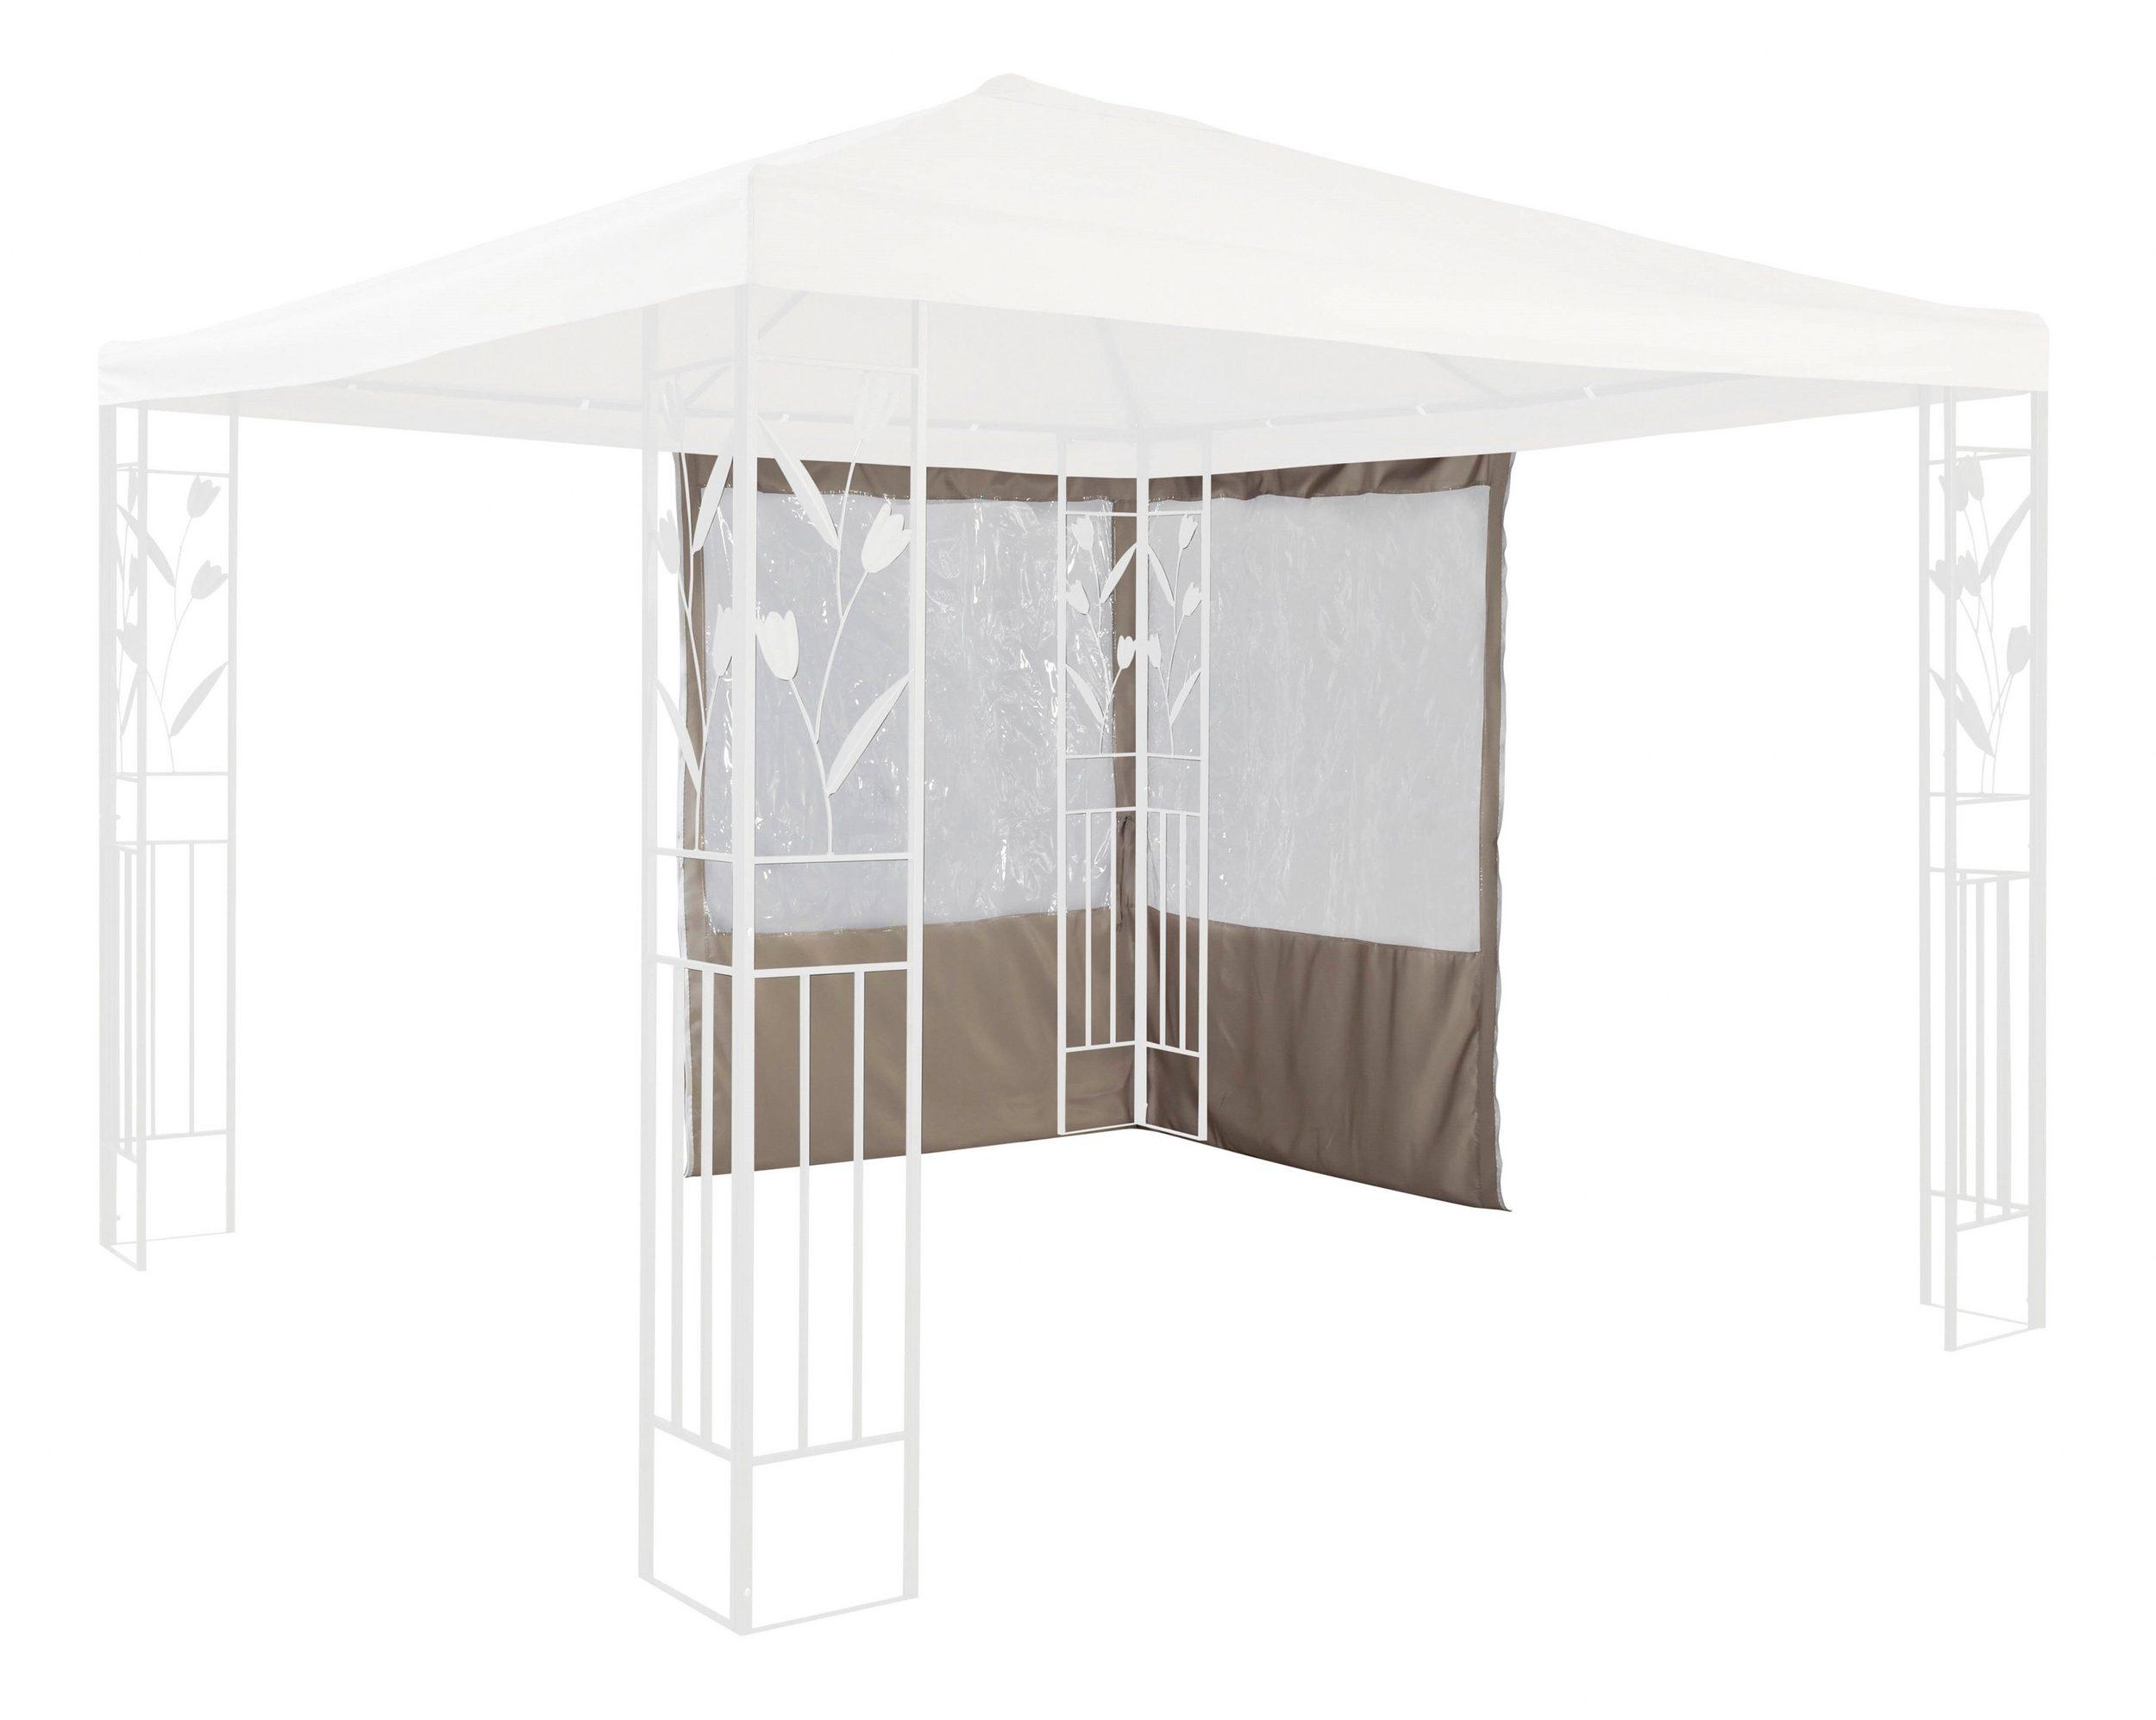 Seitenteile Pavillonseiten 2 Stück Fenster Polyester sand UVP 79,99€  7220135